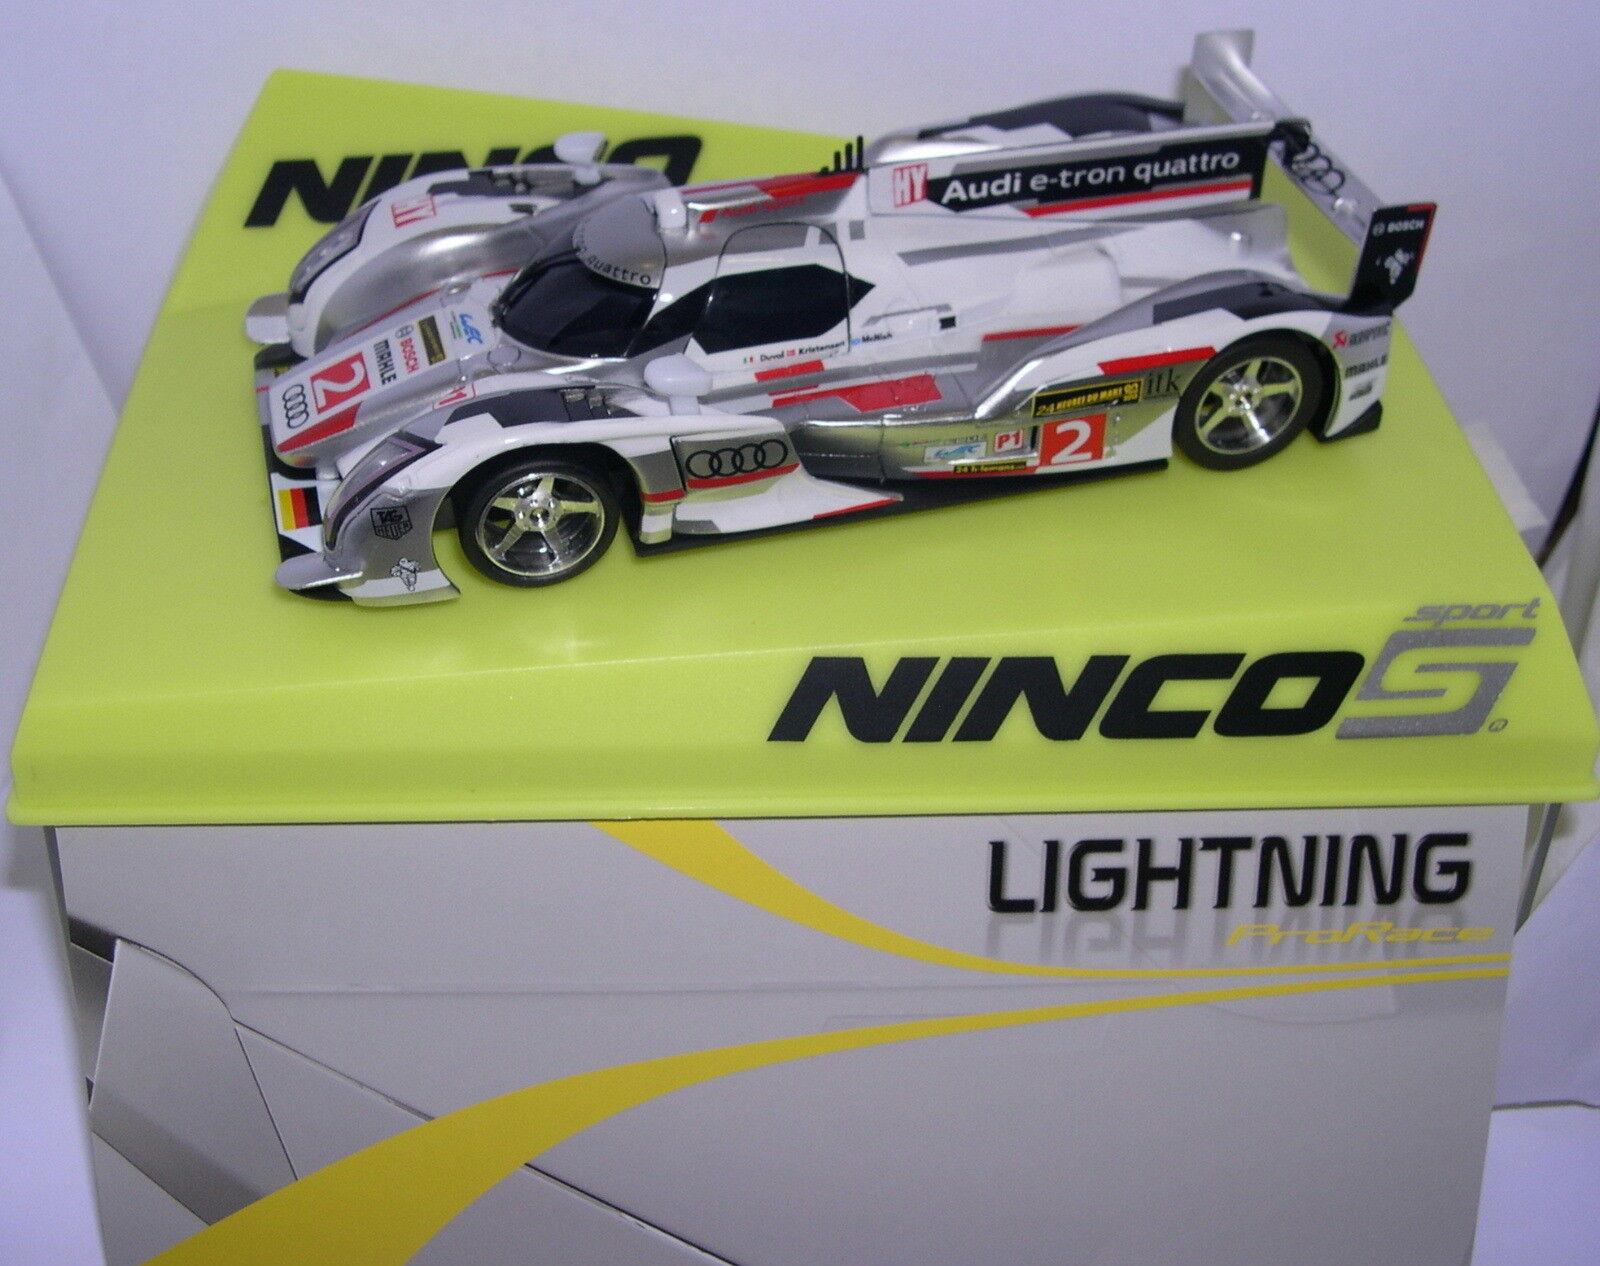 Ninco 50646 slot car audi R18 N2 ULTRA Duval-Kristensen-McNish lightning MB